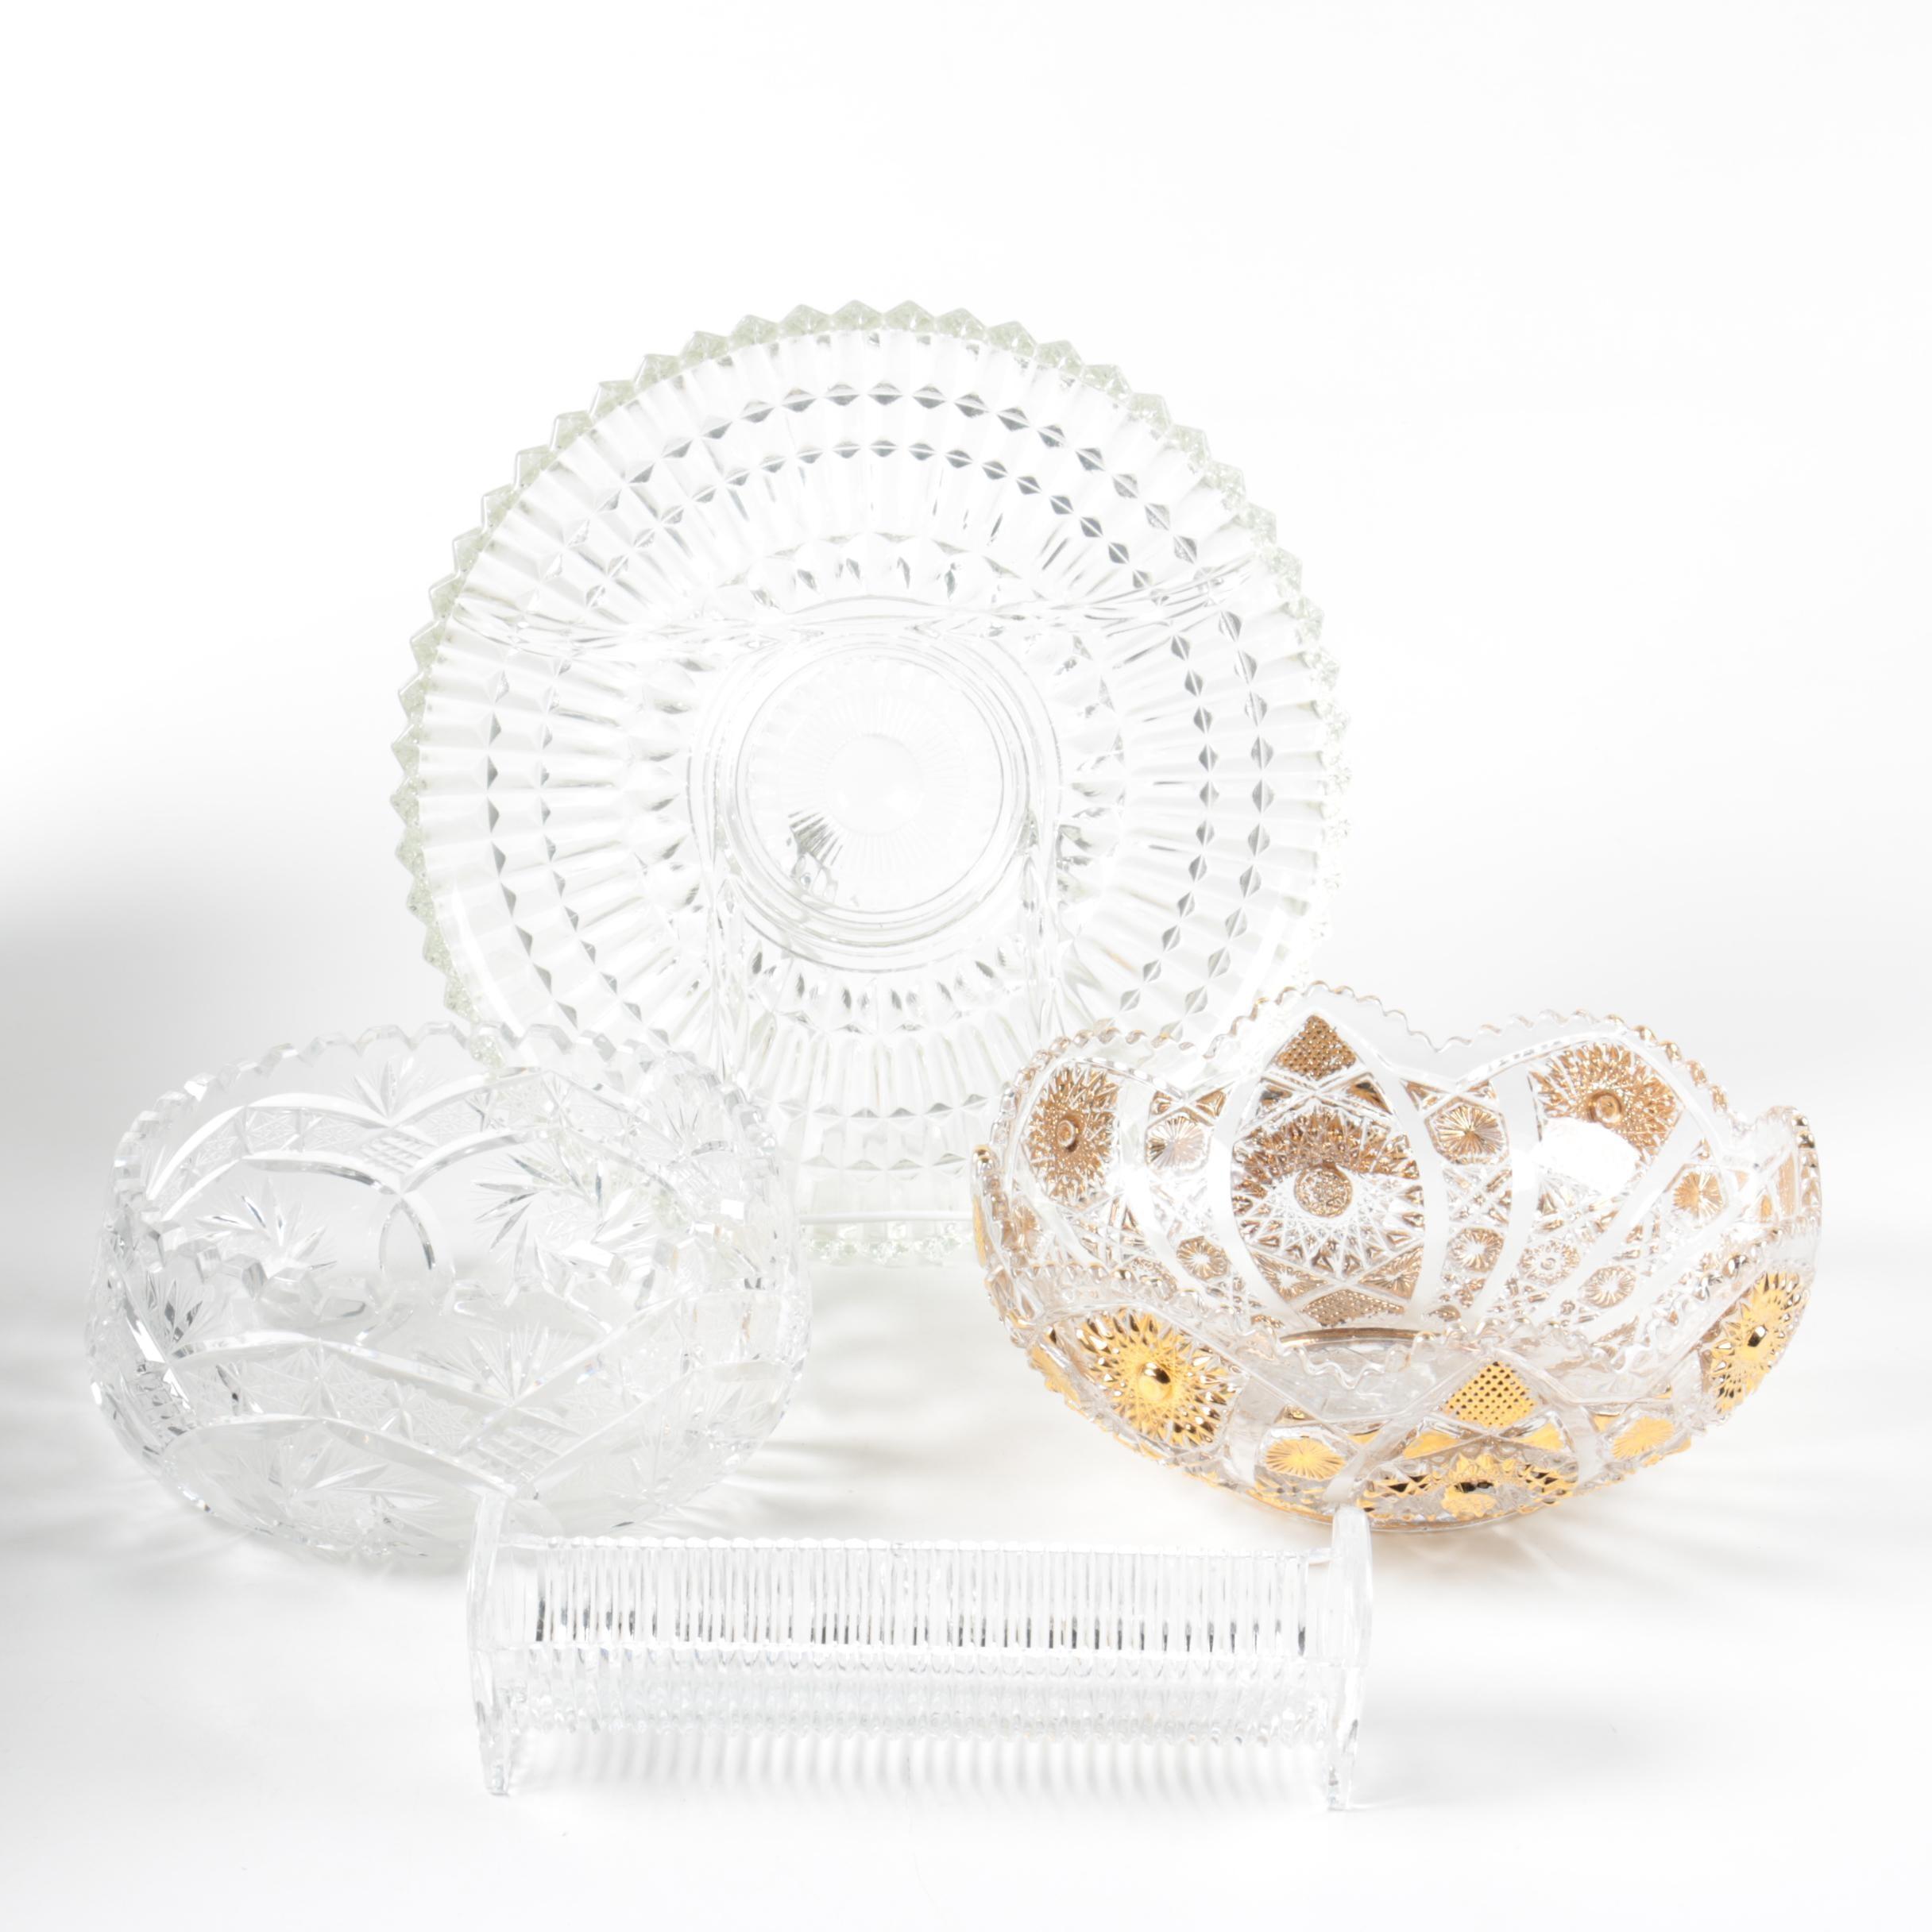 Glass Serveware Including Crystal Cracker Tray